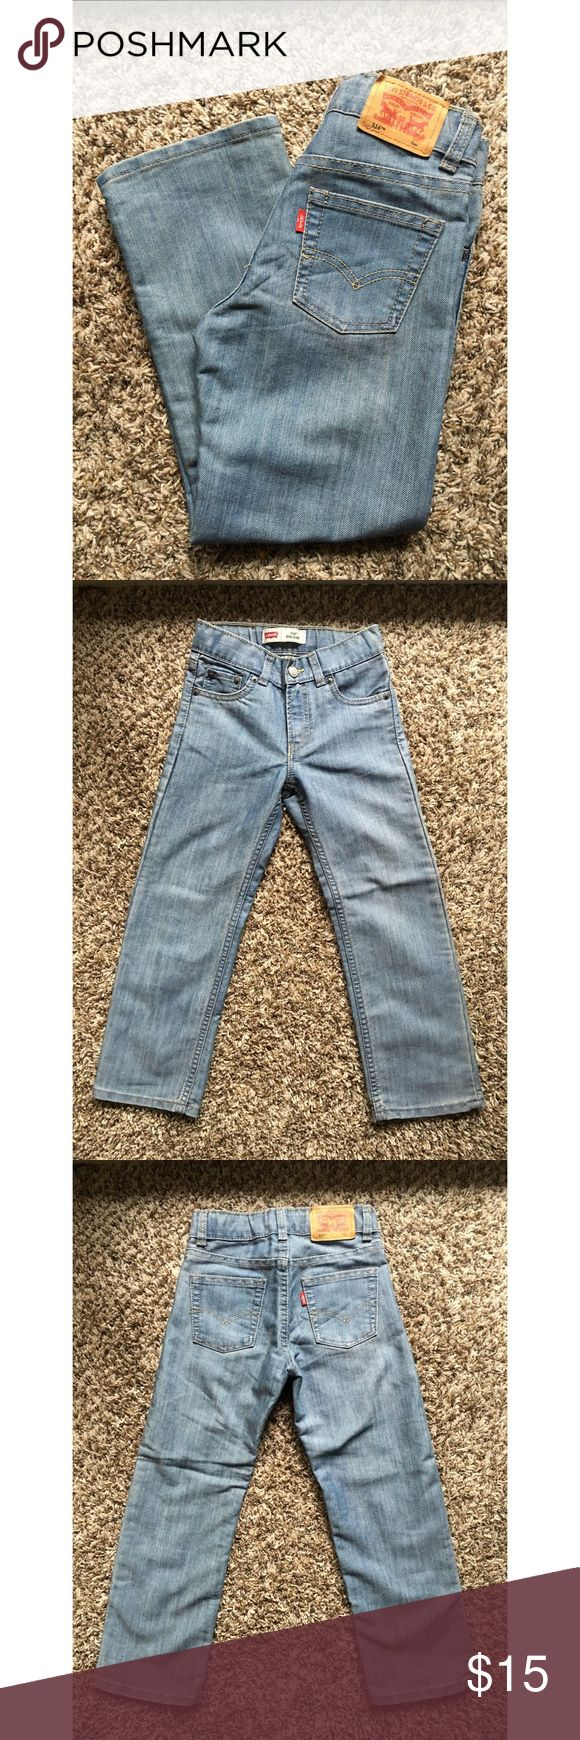 Boys' Levi's Jeans SALE Light blue, 7 slim fit, NWOT, adjustable waist. NO TRADES, FIRM PRICE. Levi's Bottoms Jeans